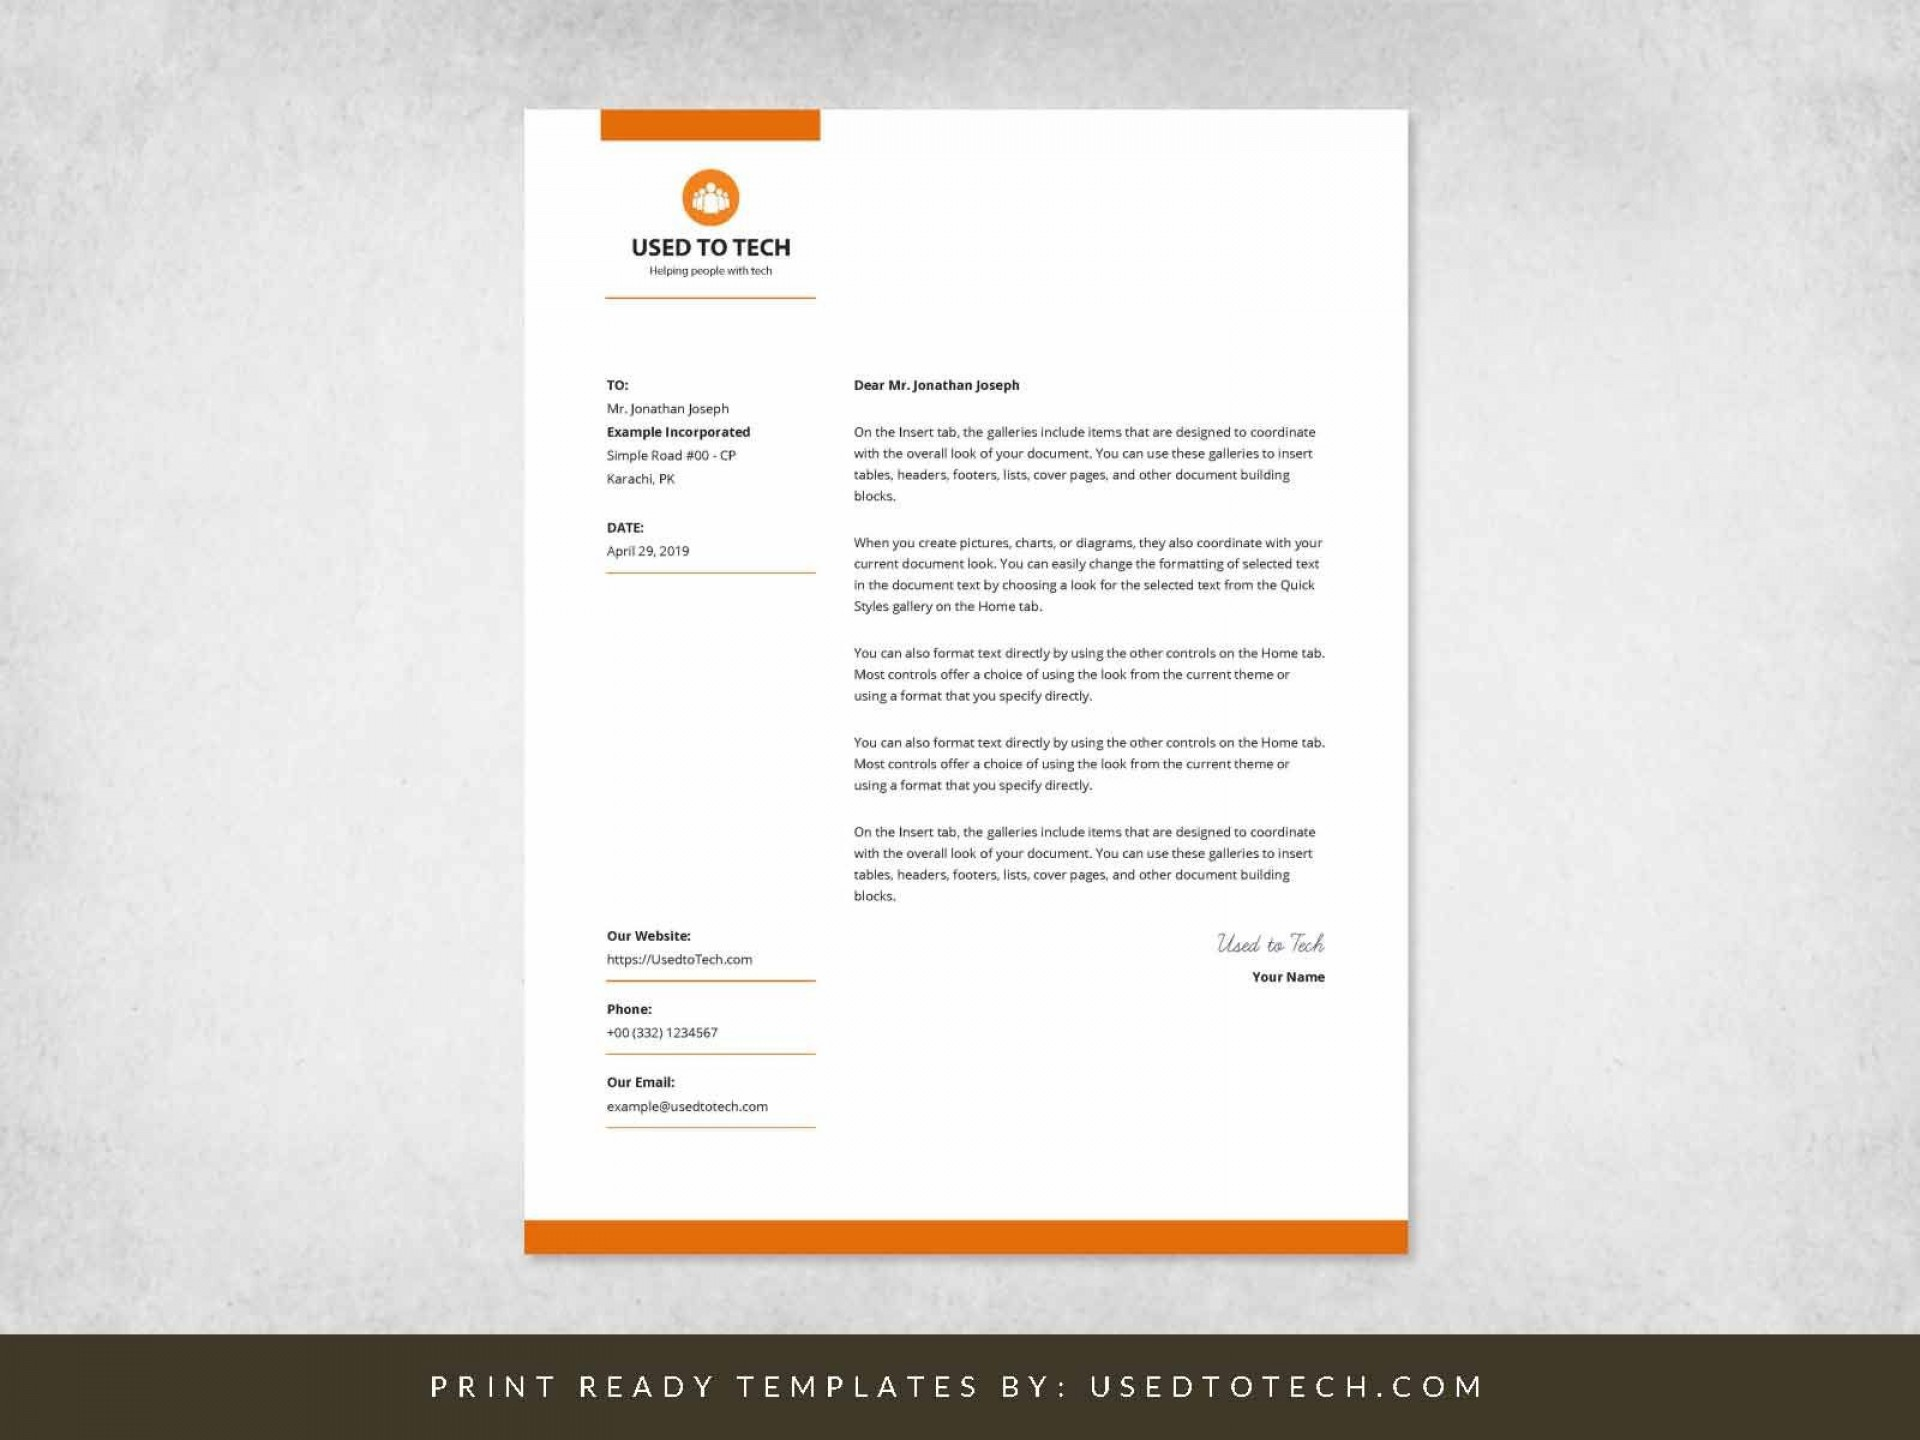 000 Impressive Letterhead Sample Free Download Image  Construction Company Template1920